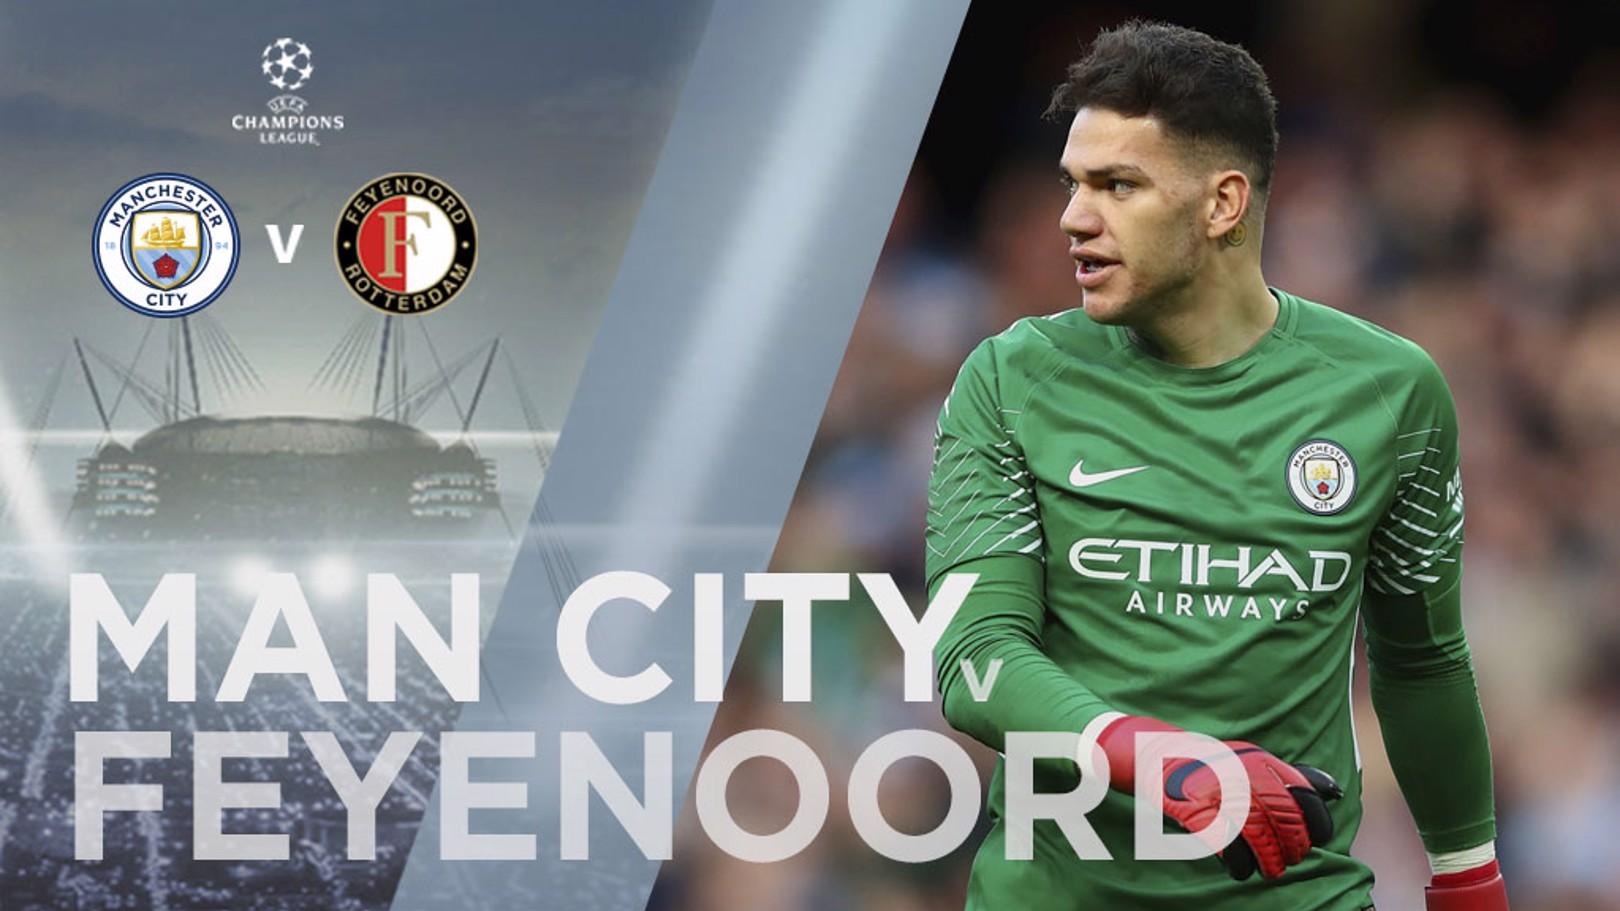 Man City x Feyenoord Ederson